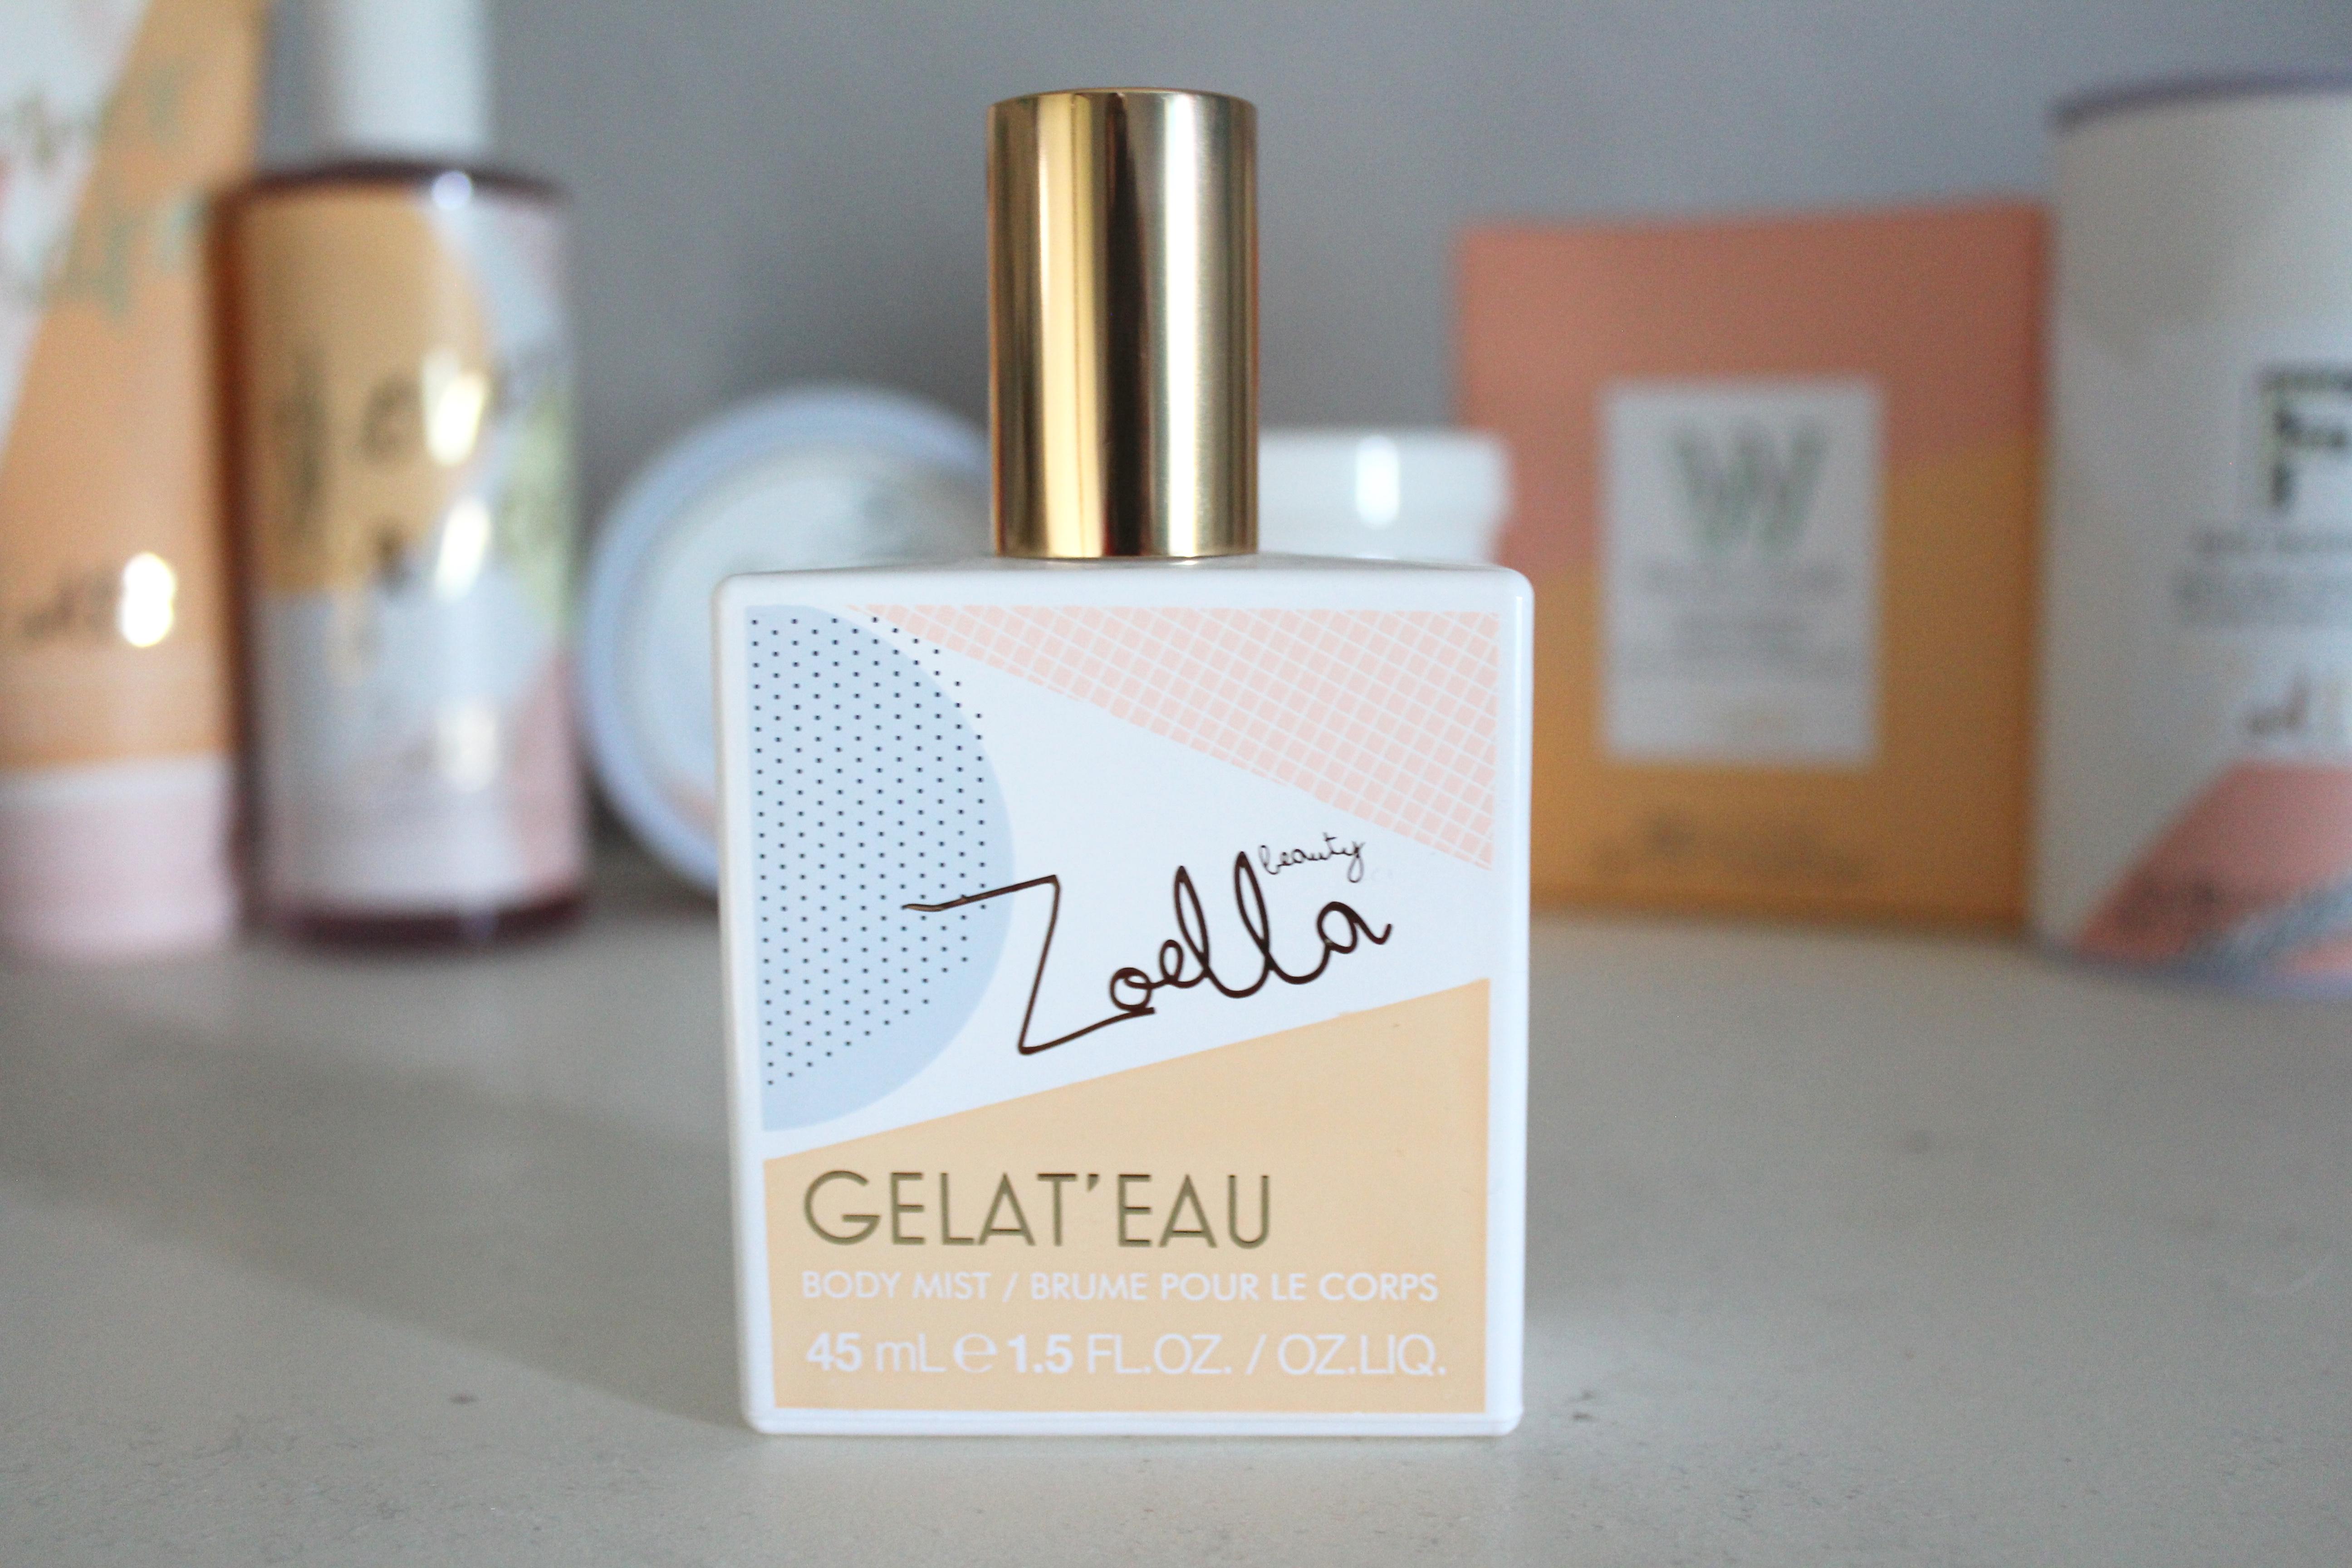 Zoella gelat'eau body mist